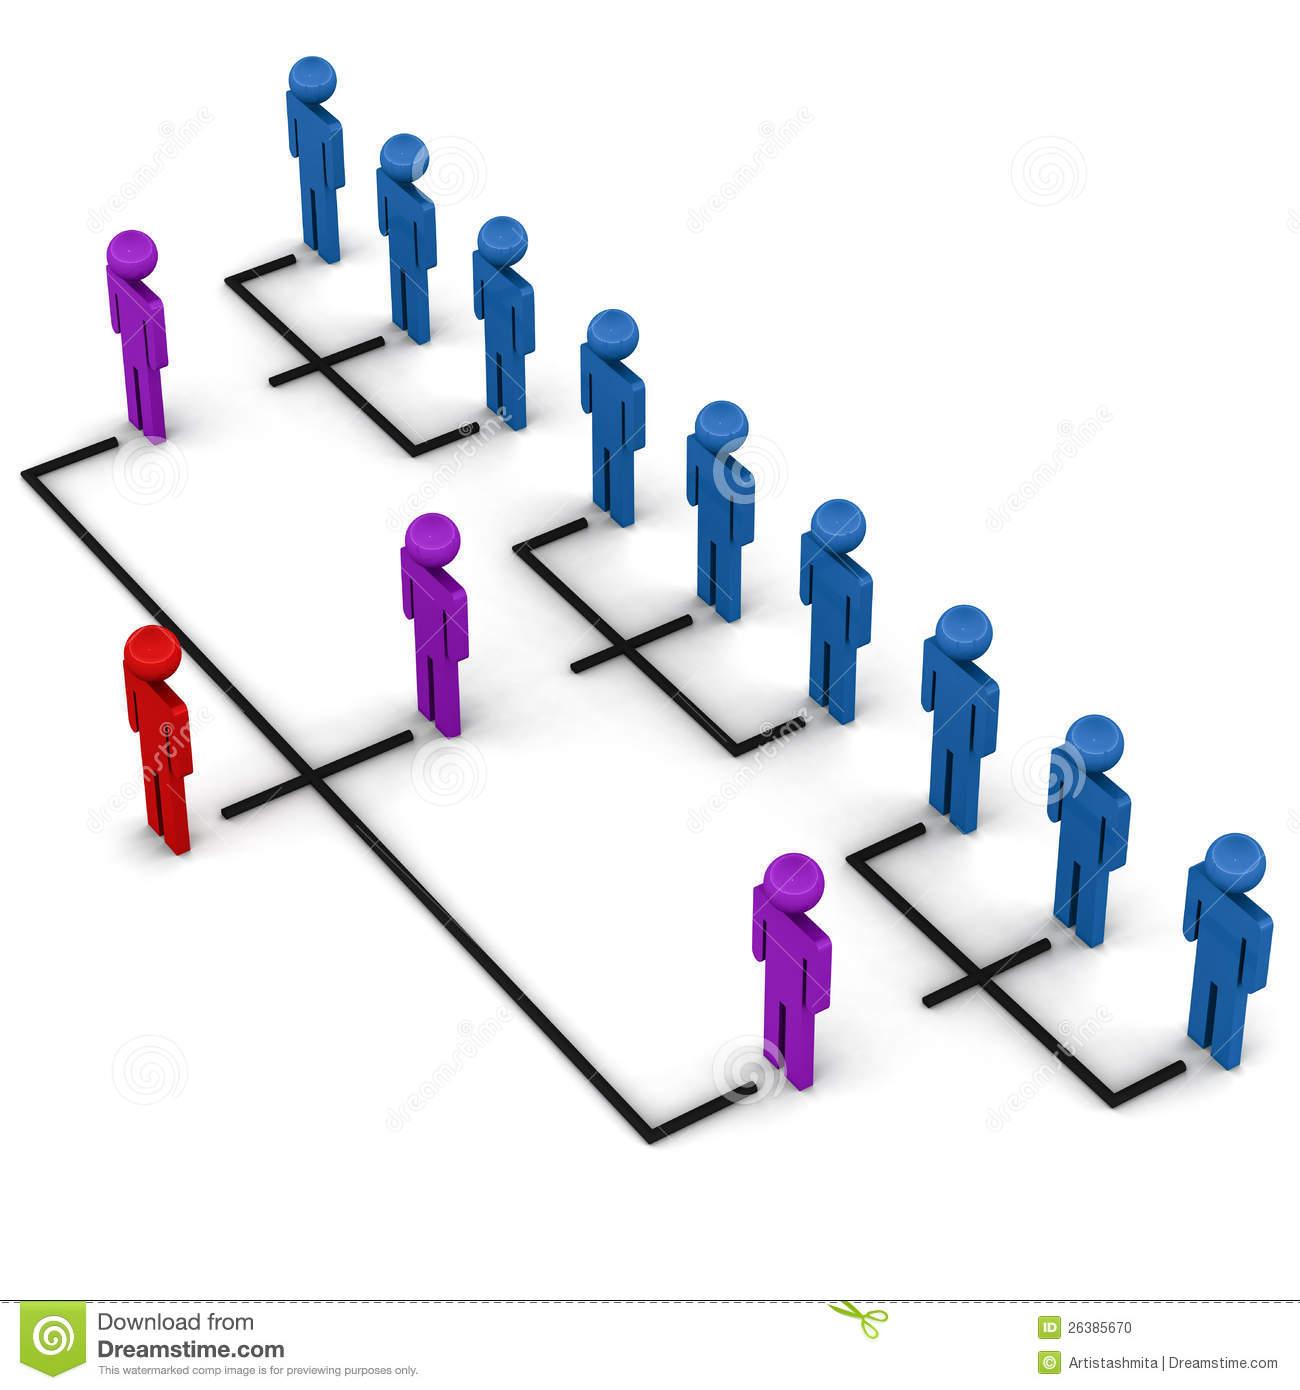 Organizational hierarchy clipart.